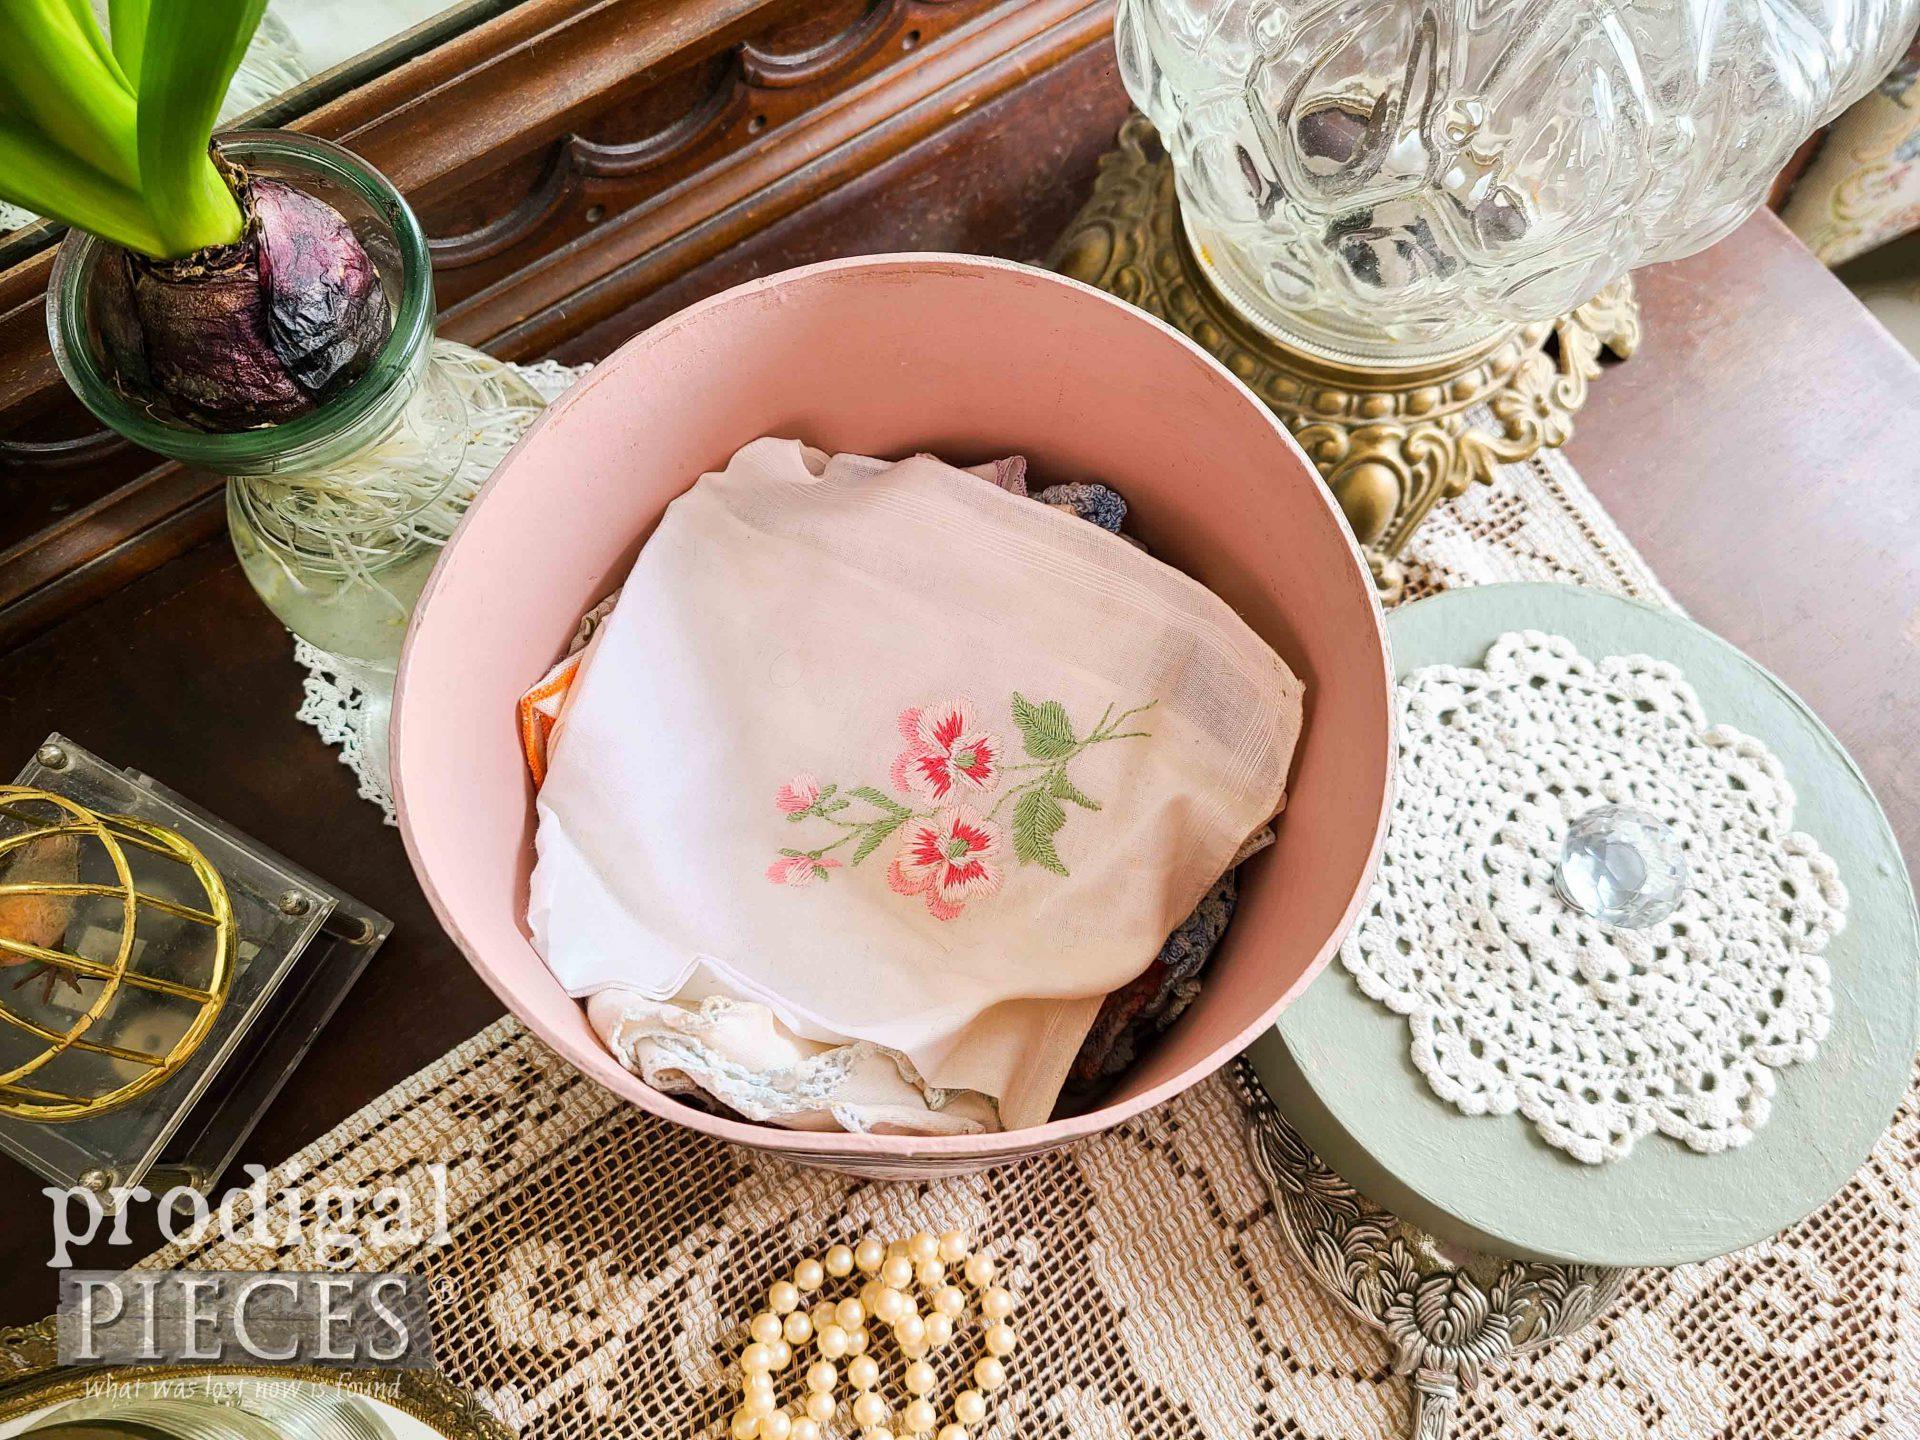 Vintage Hankies Pile in DIY Decoupage Box by Larissa of Prodigal Pieces | prodigalpieces.com #prodigalpieces #diy #home